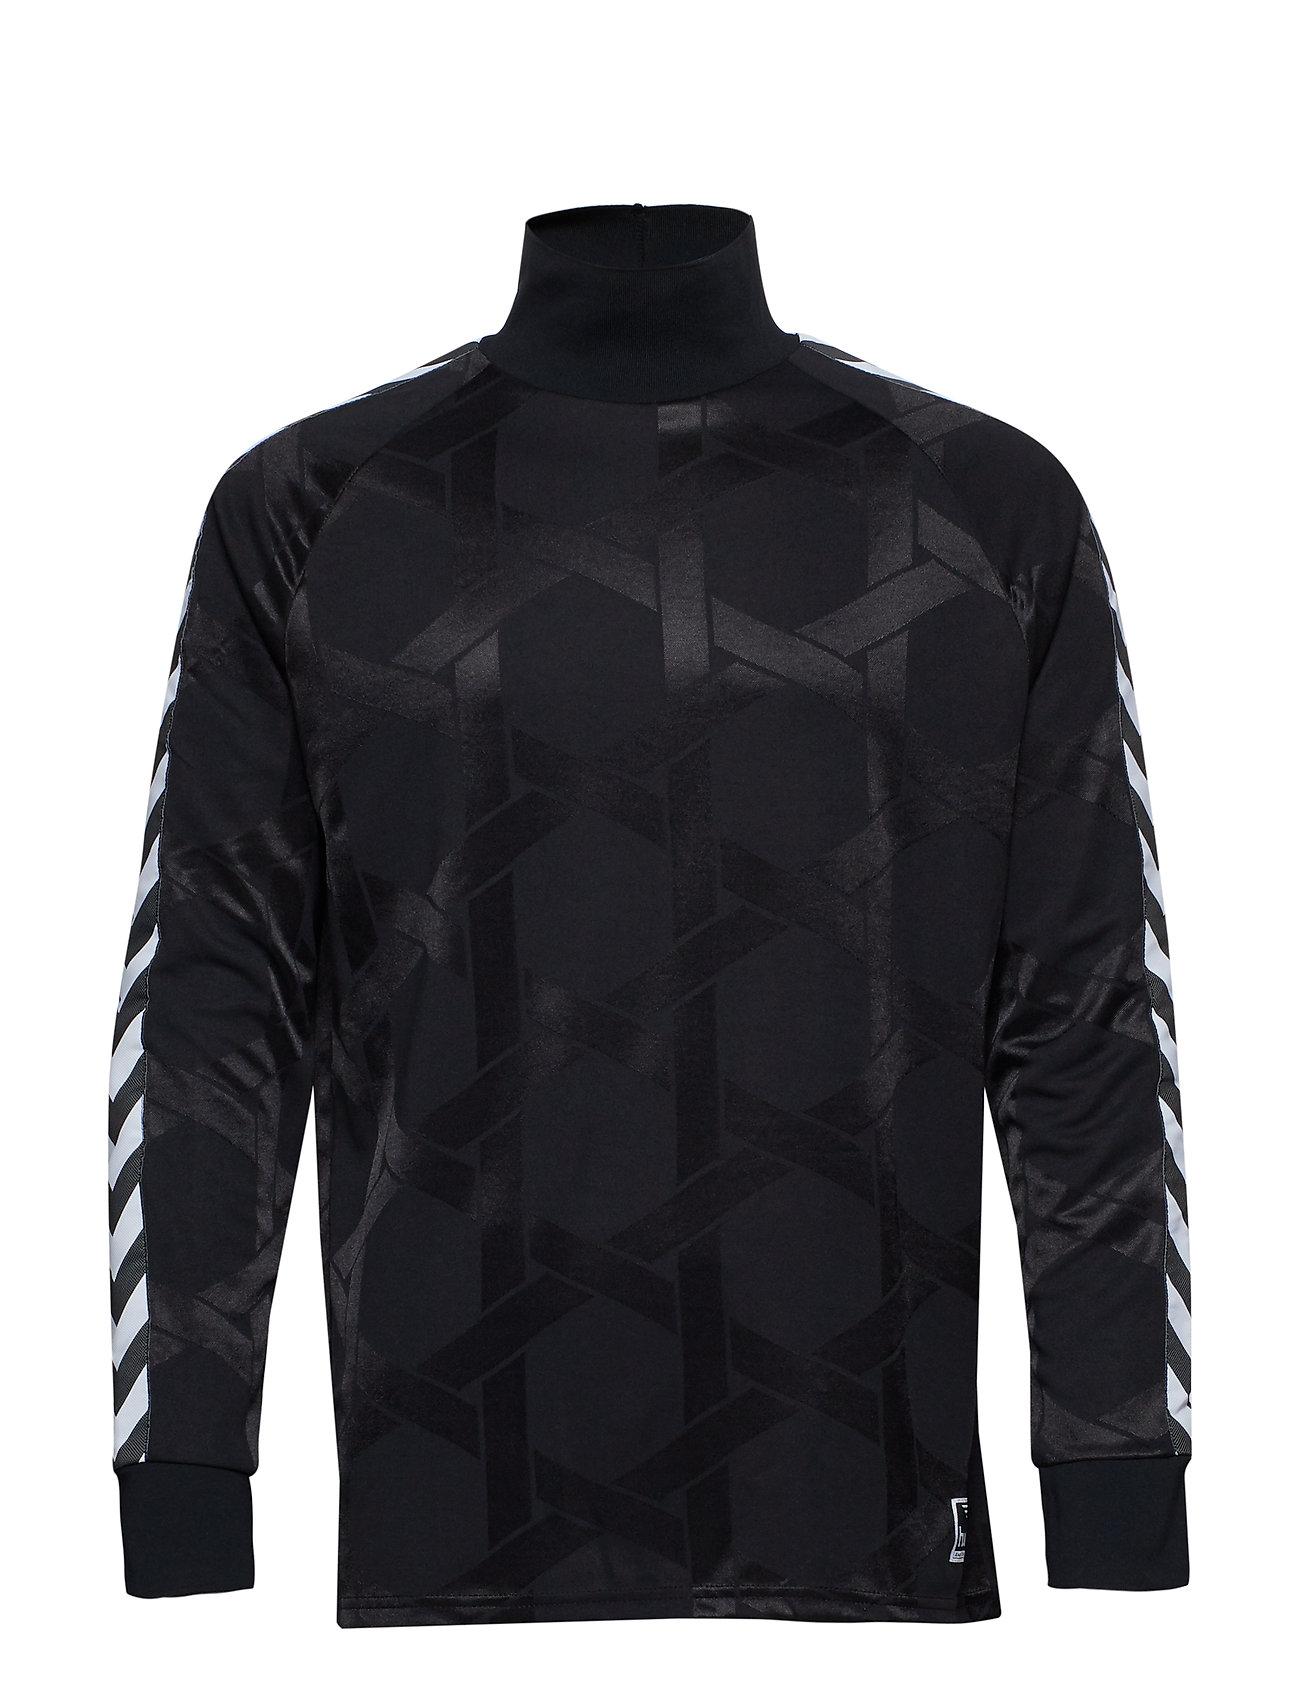 Hmlcarsten L shirt Hive T sblackHummel hCBQrtdsx